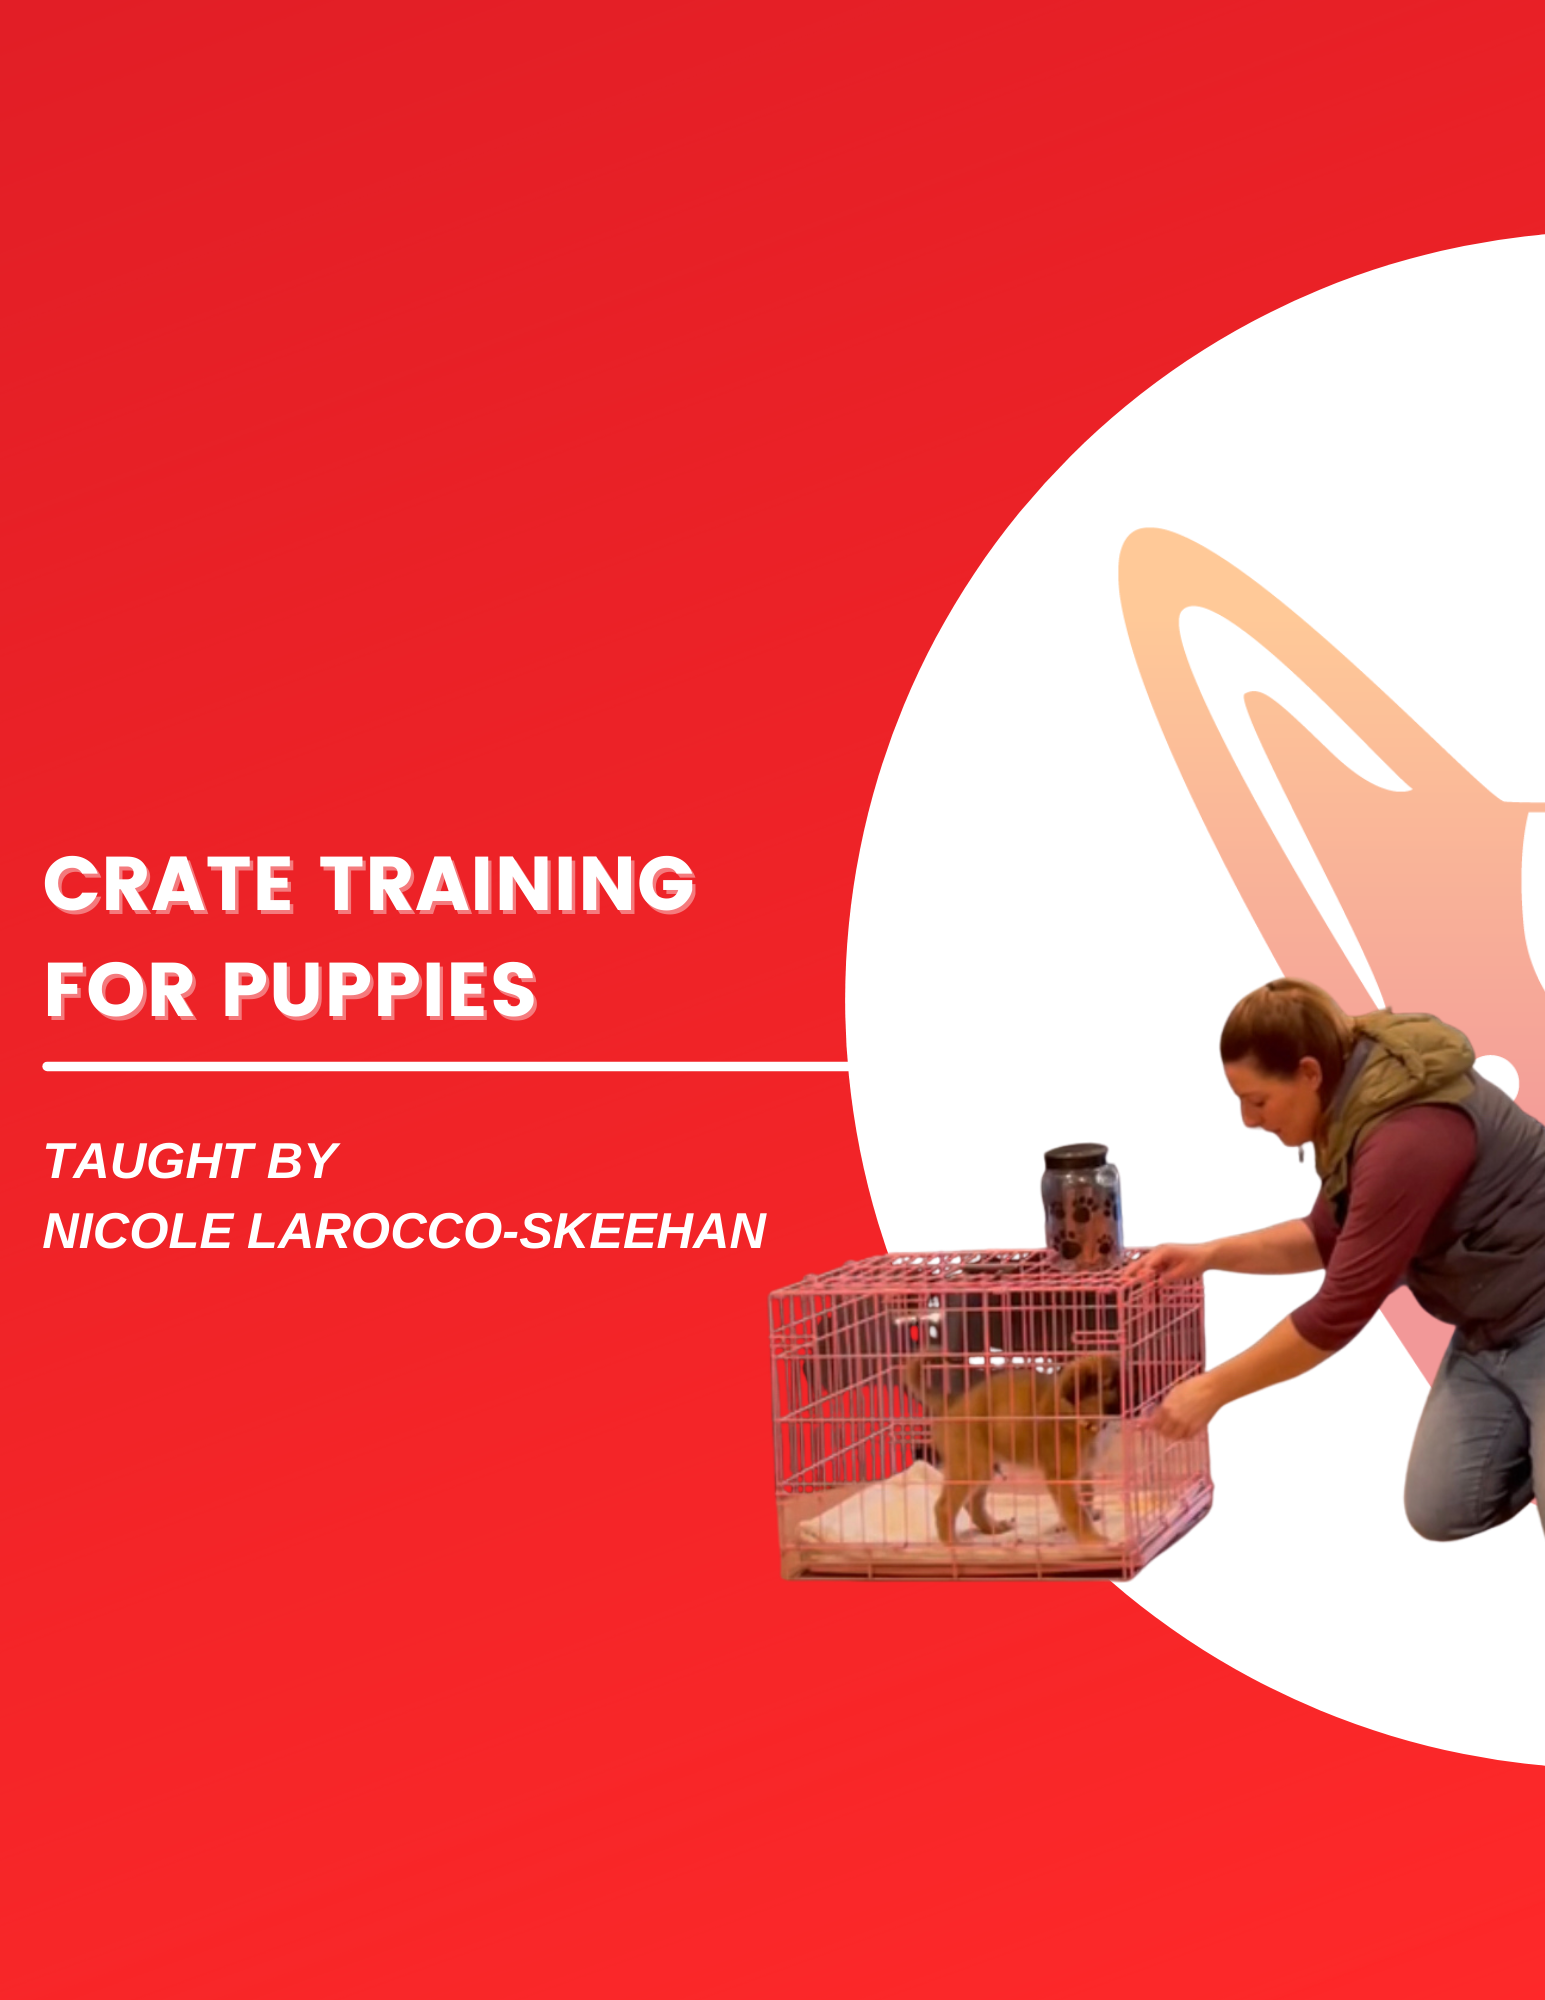 crate dog training videos